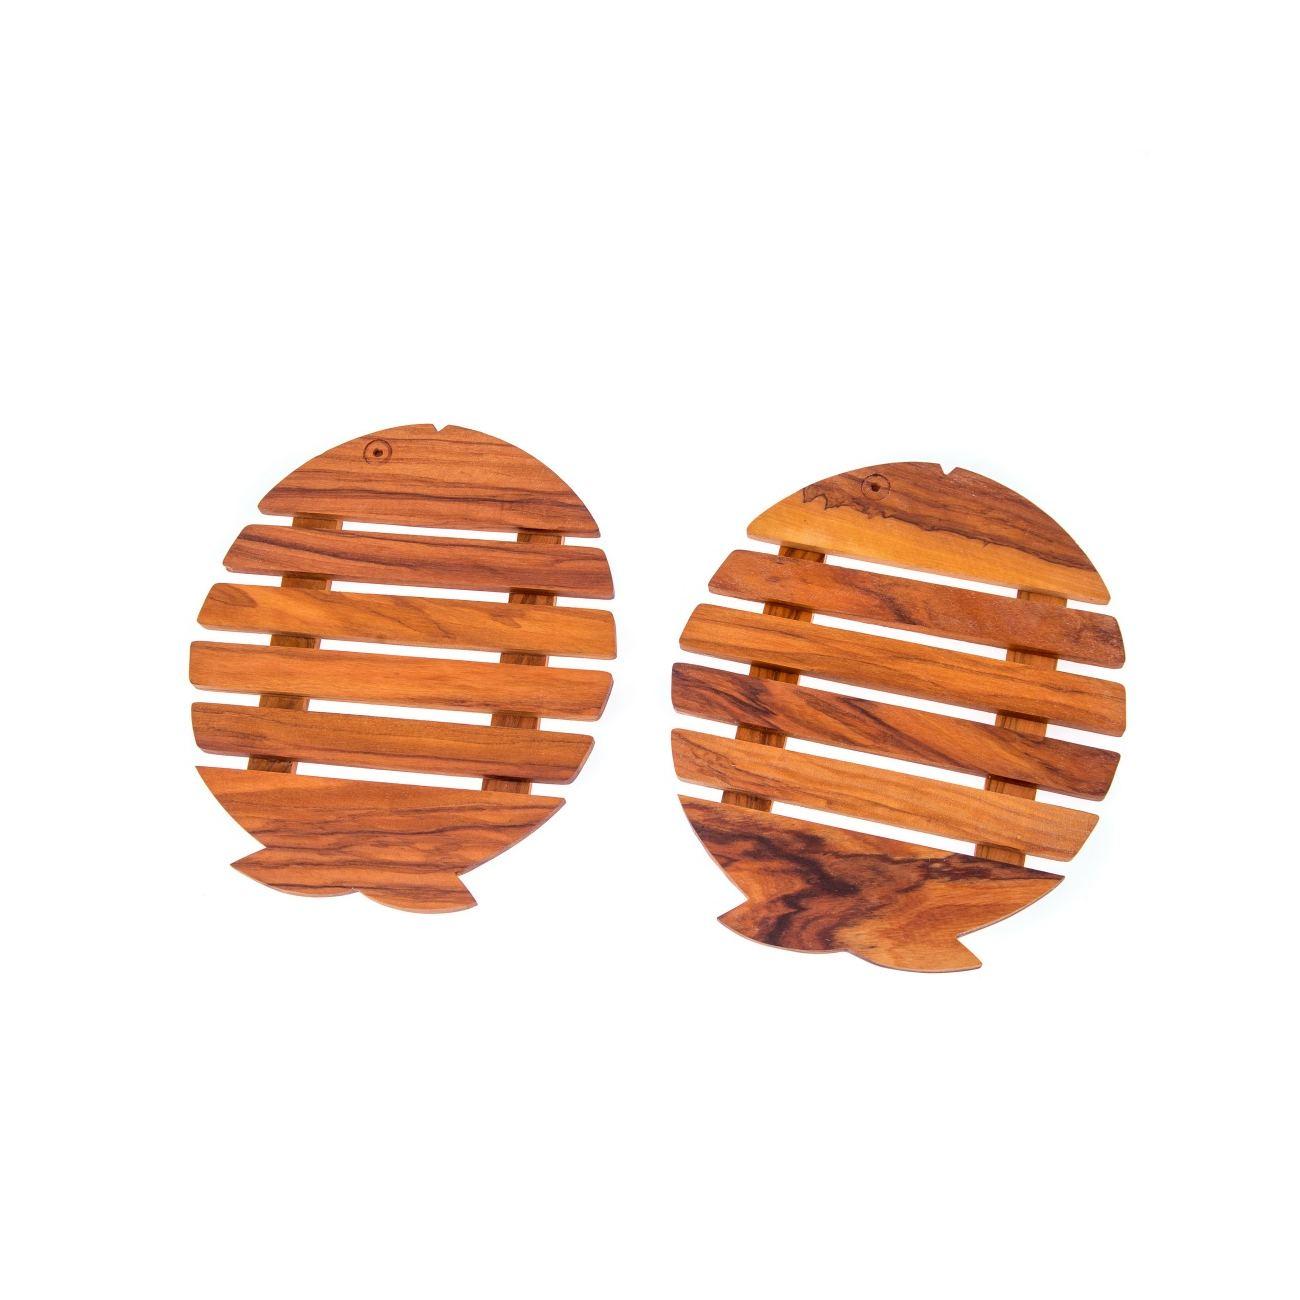 Olive Wood Pot Coasters or Trivets Set of 2 - Heat Resistant, Fish ...